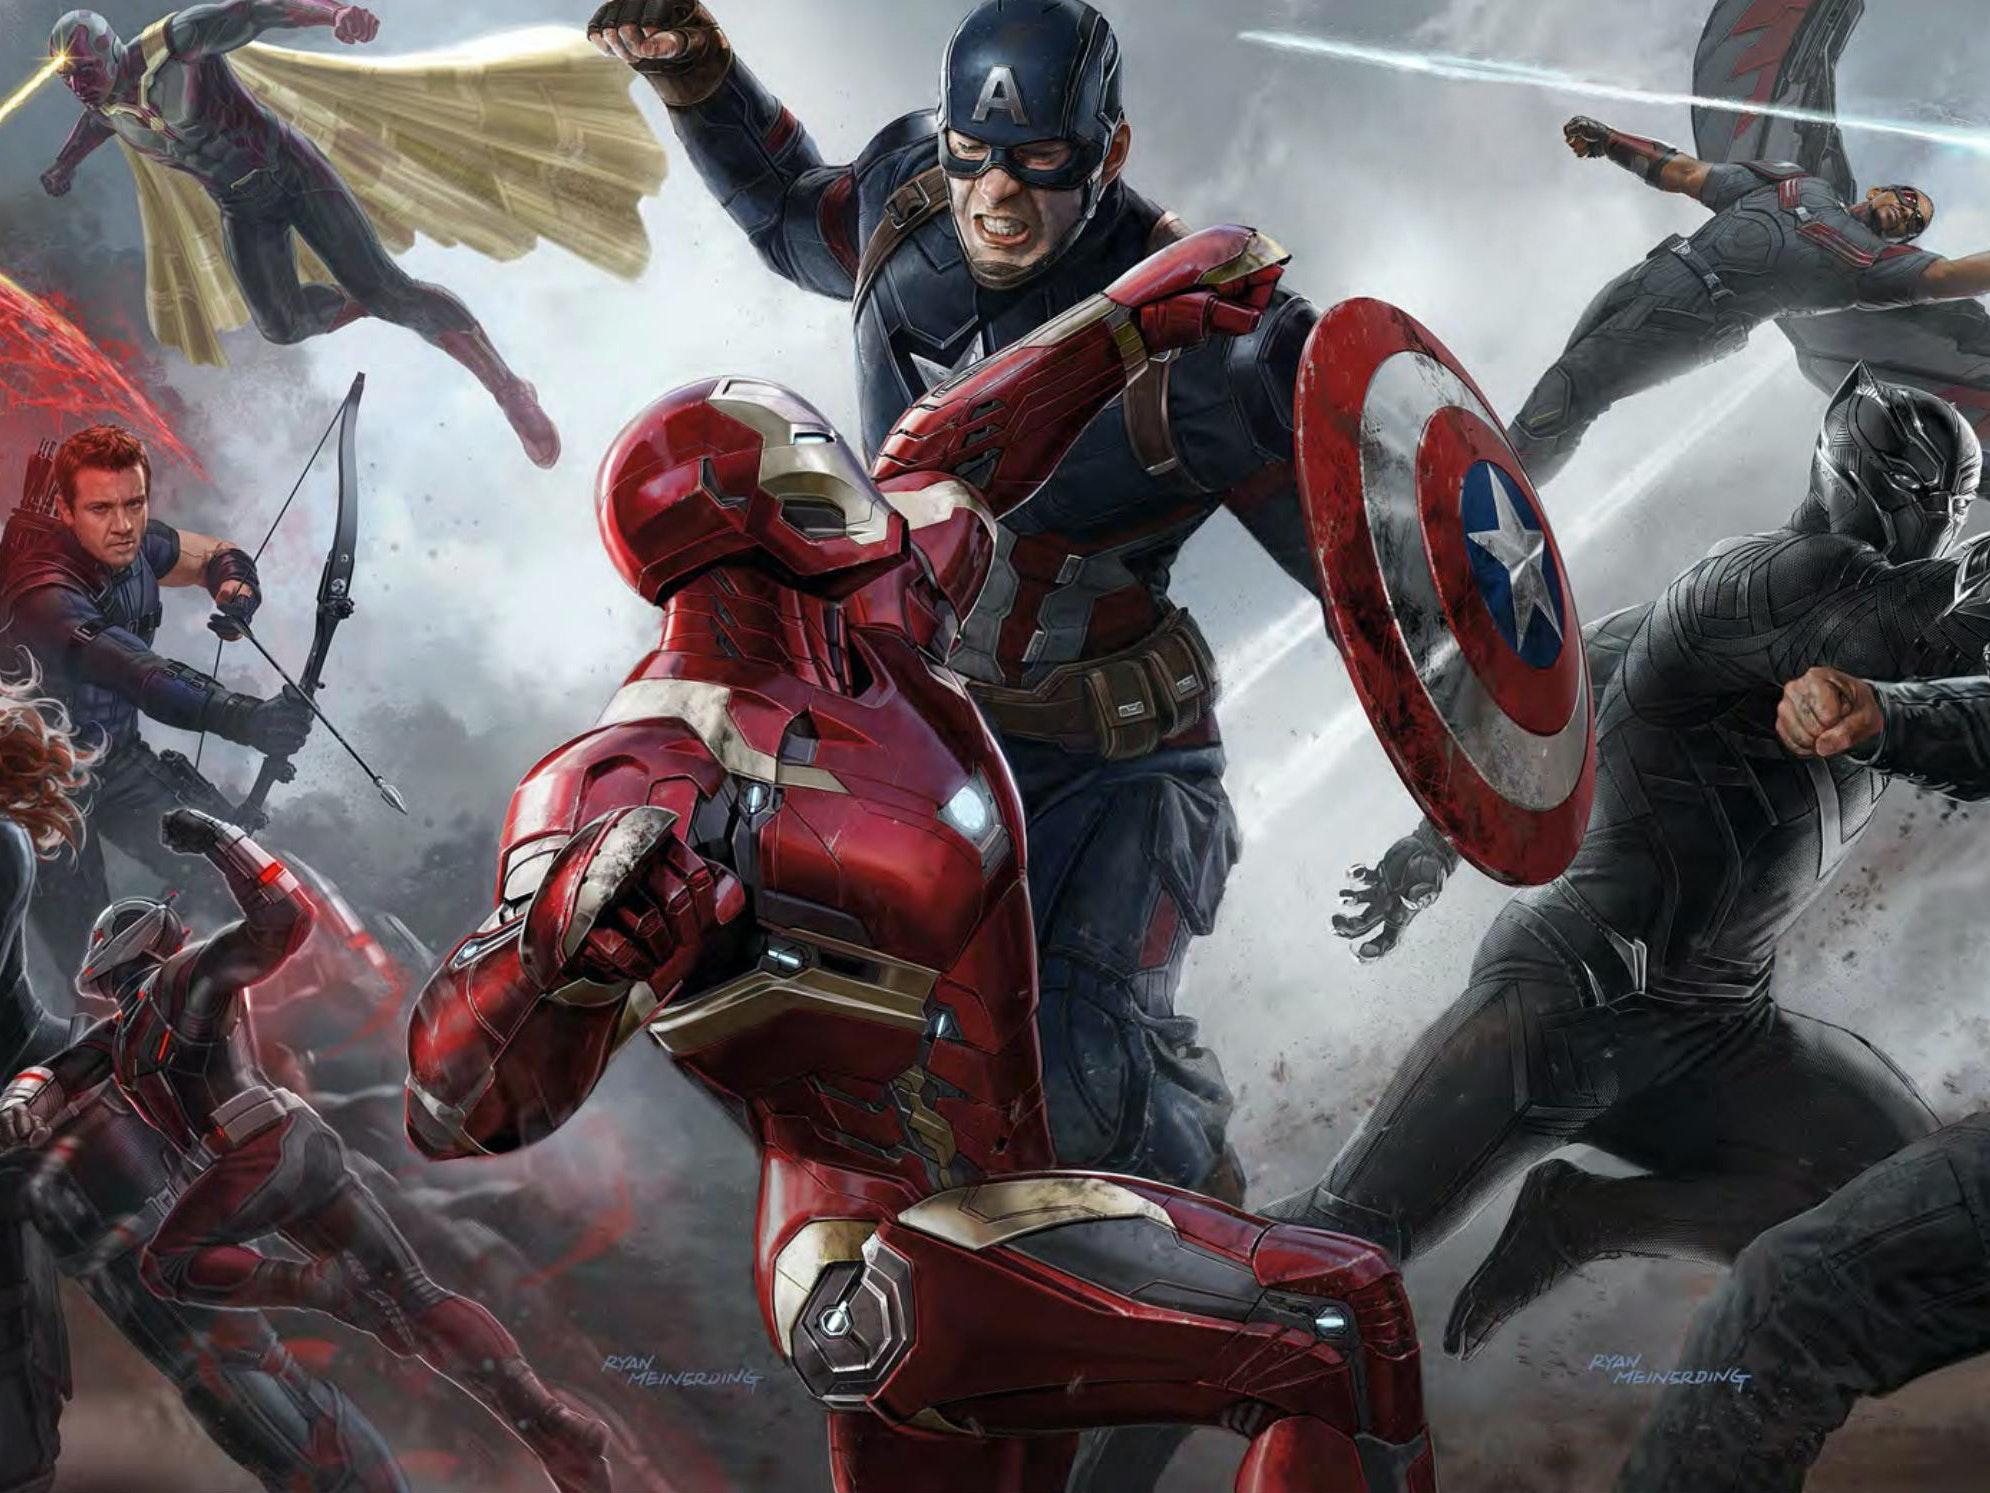 Captain America: Civil War from Marvel Studios and Disney